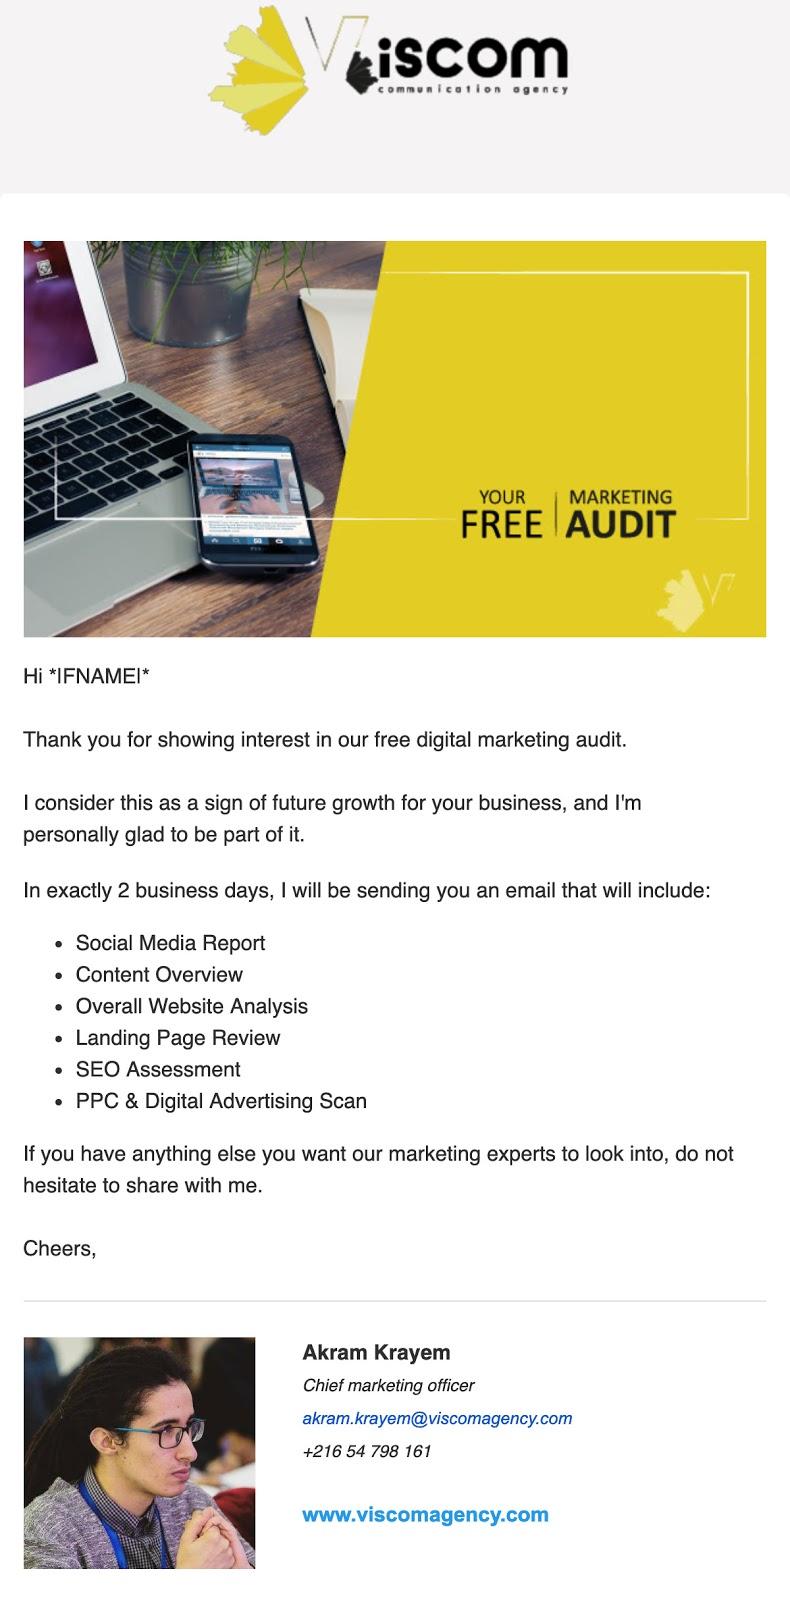 Viscom-B2B-email-campaign